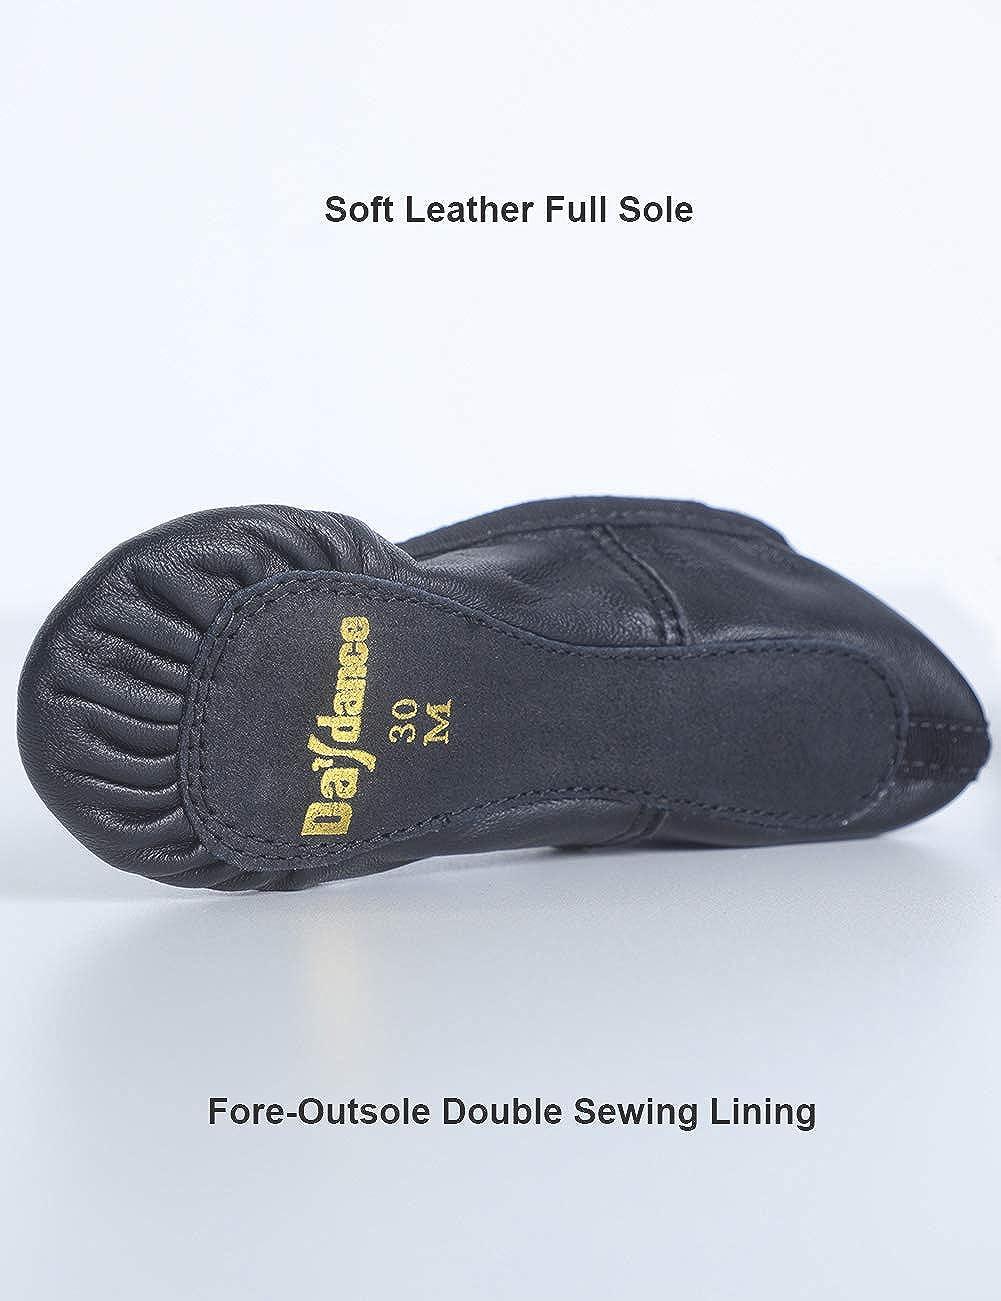 Toddler Premium Leather Ballet Shoes Full Sole Dance Slippers for Kids Little Girls 3-12T